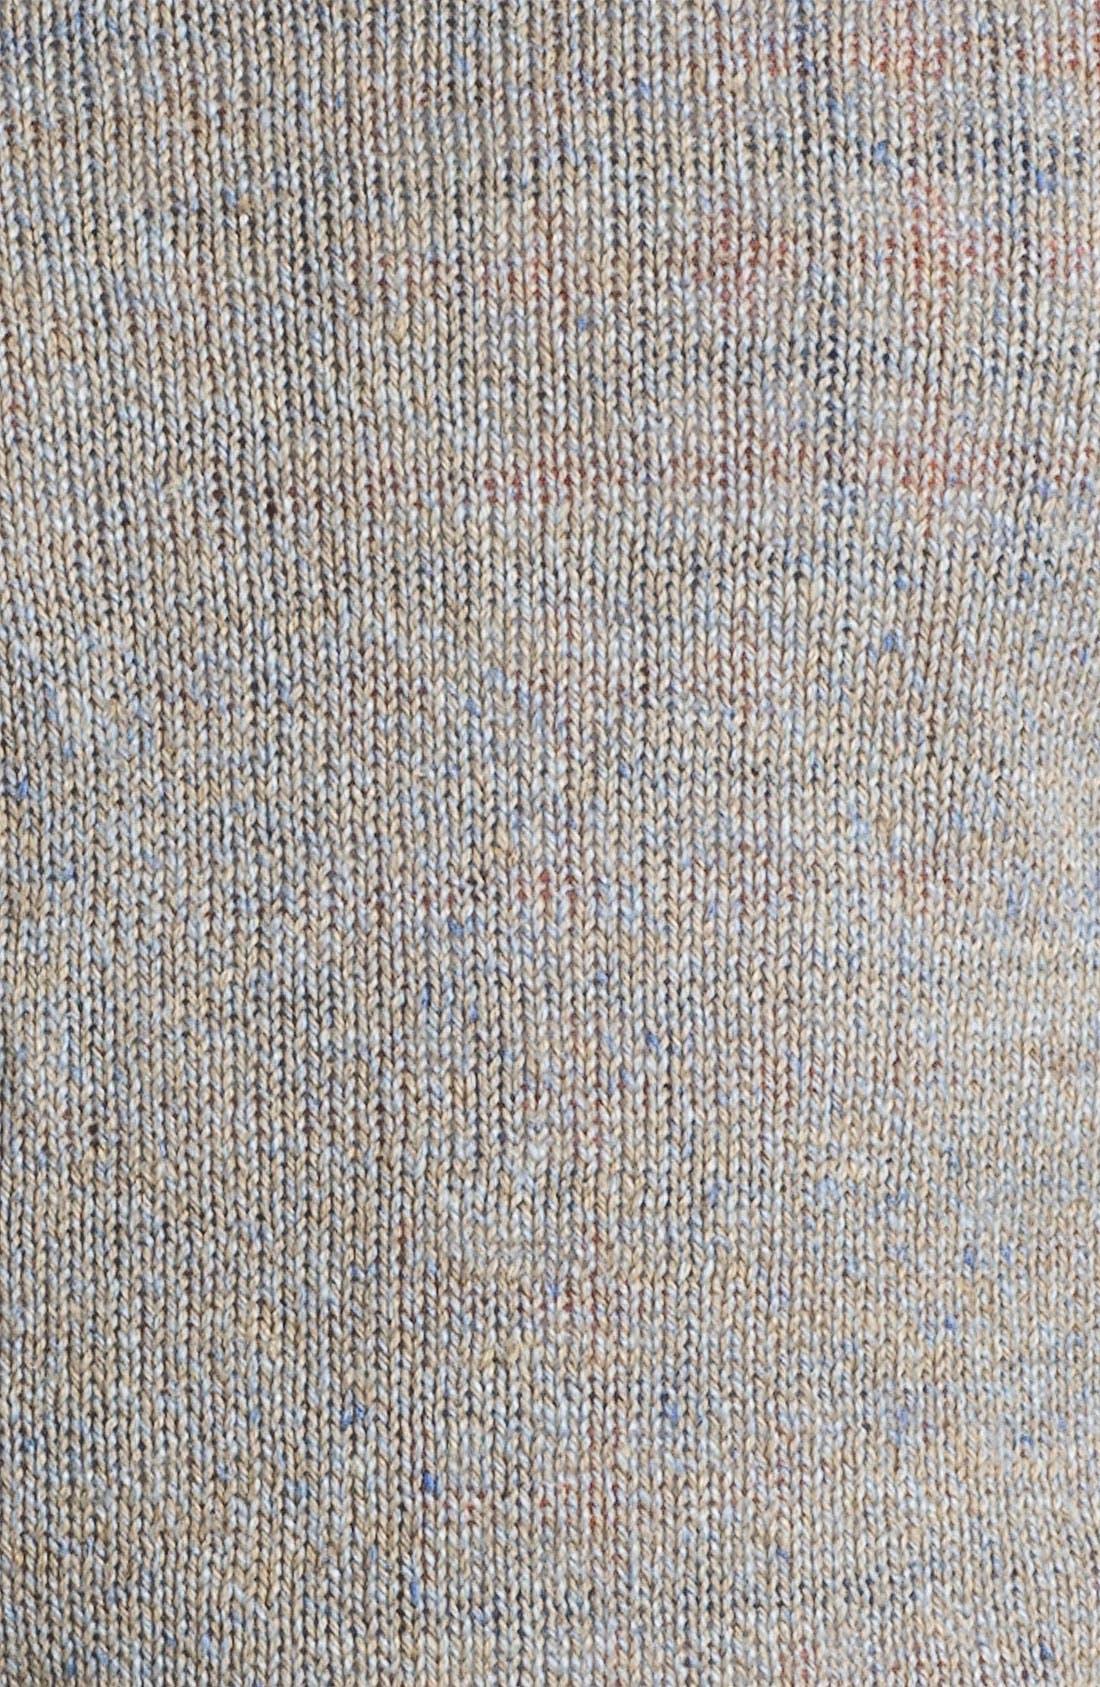 Alternate Image 3  - Hickey Freeman 'Beach' Linen Blend Sweater